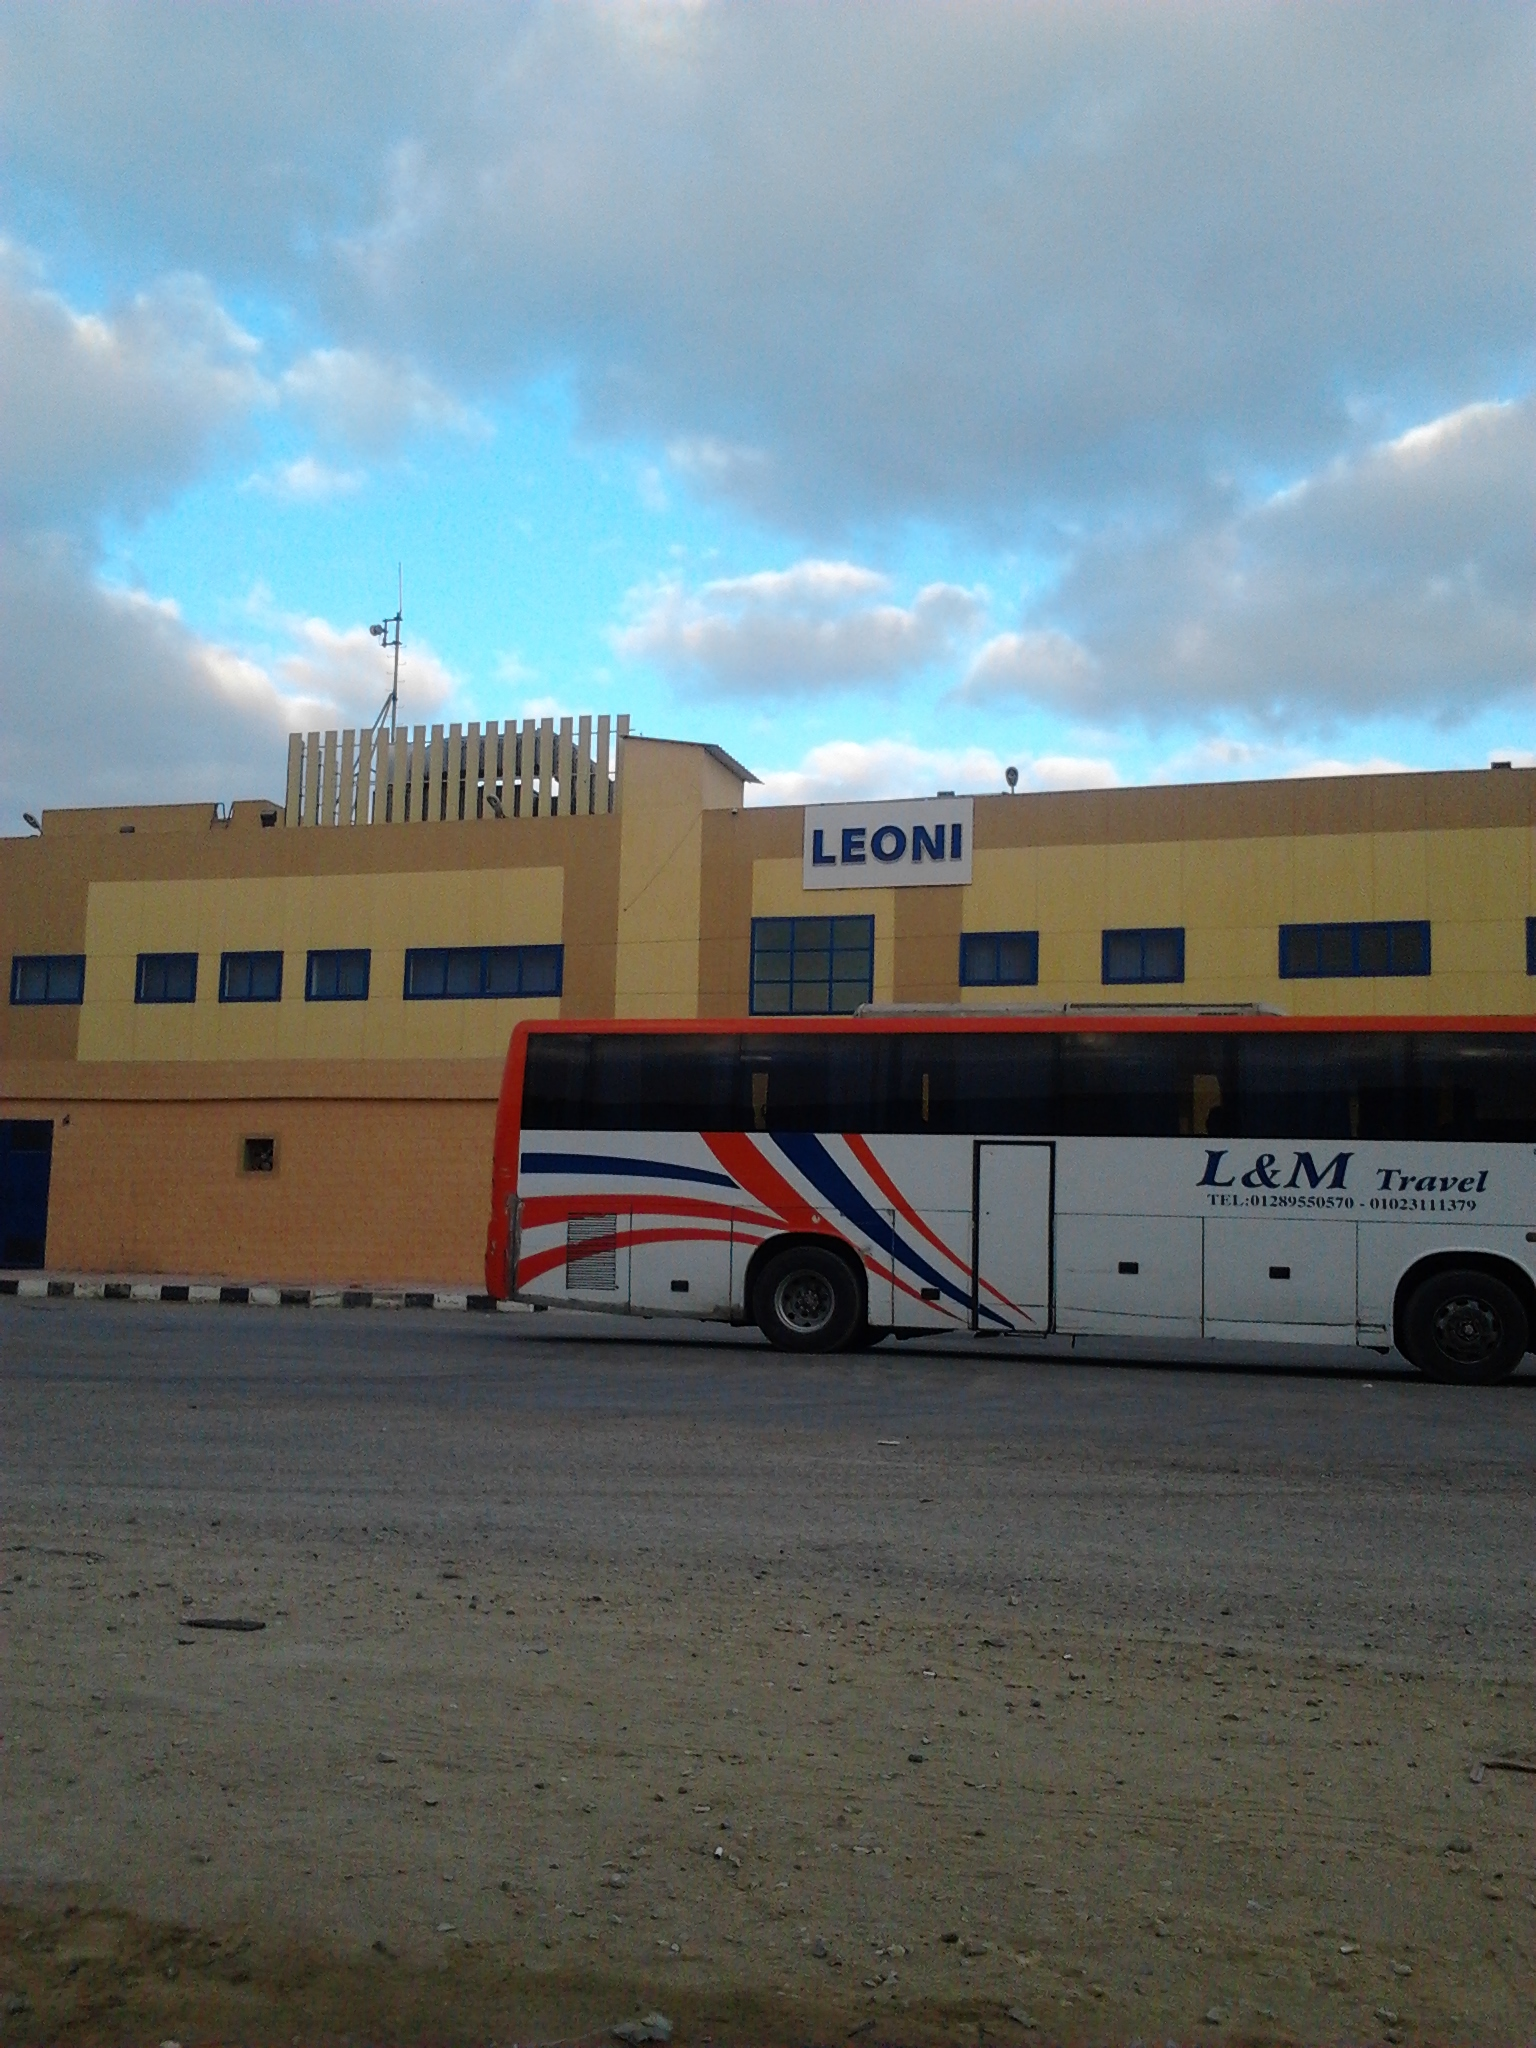 Phenomenal Leoni Wiring Systems Egypt Badr Plant 2 Bmw Bu Badr City Wiring Cloud Hisonuggs Outletorg